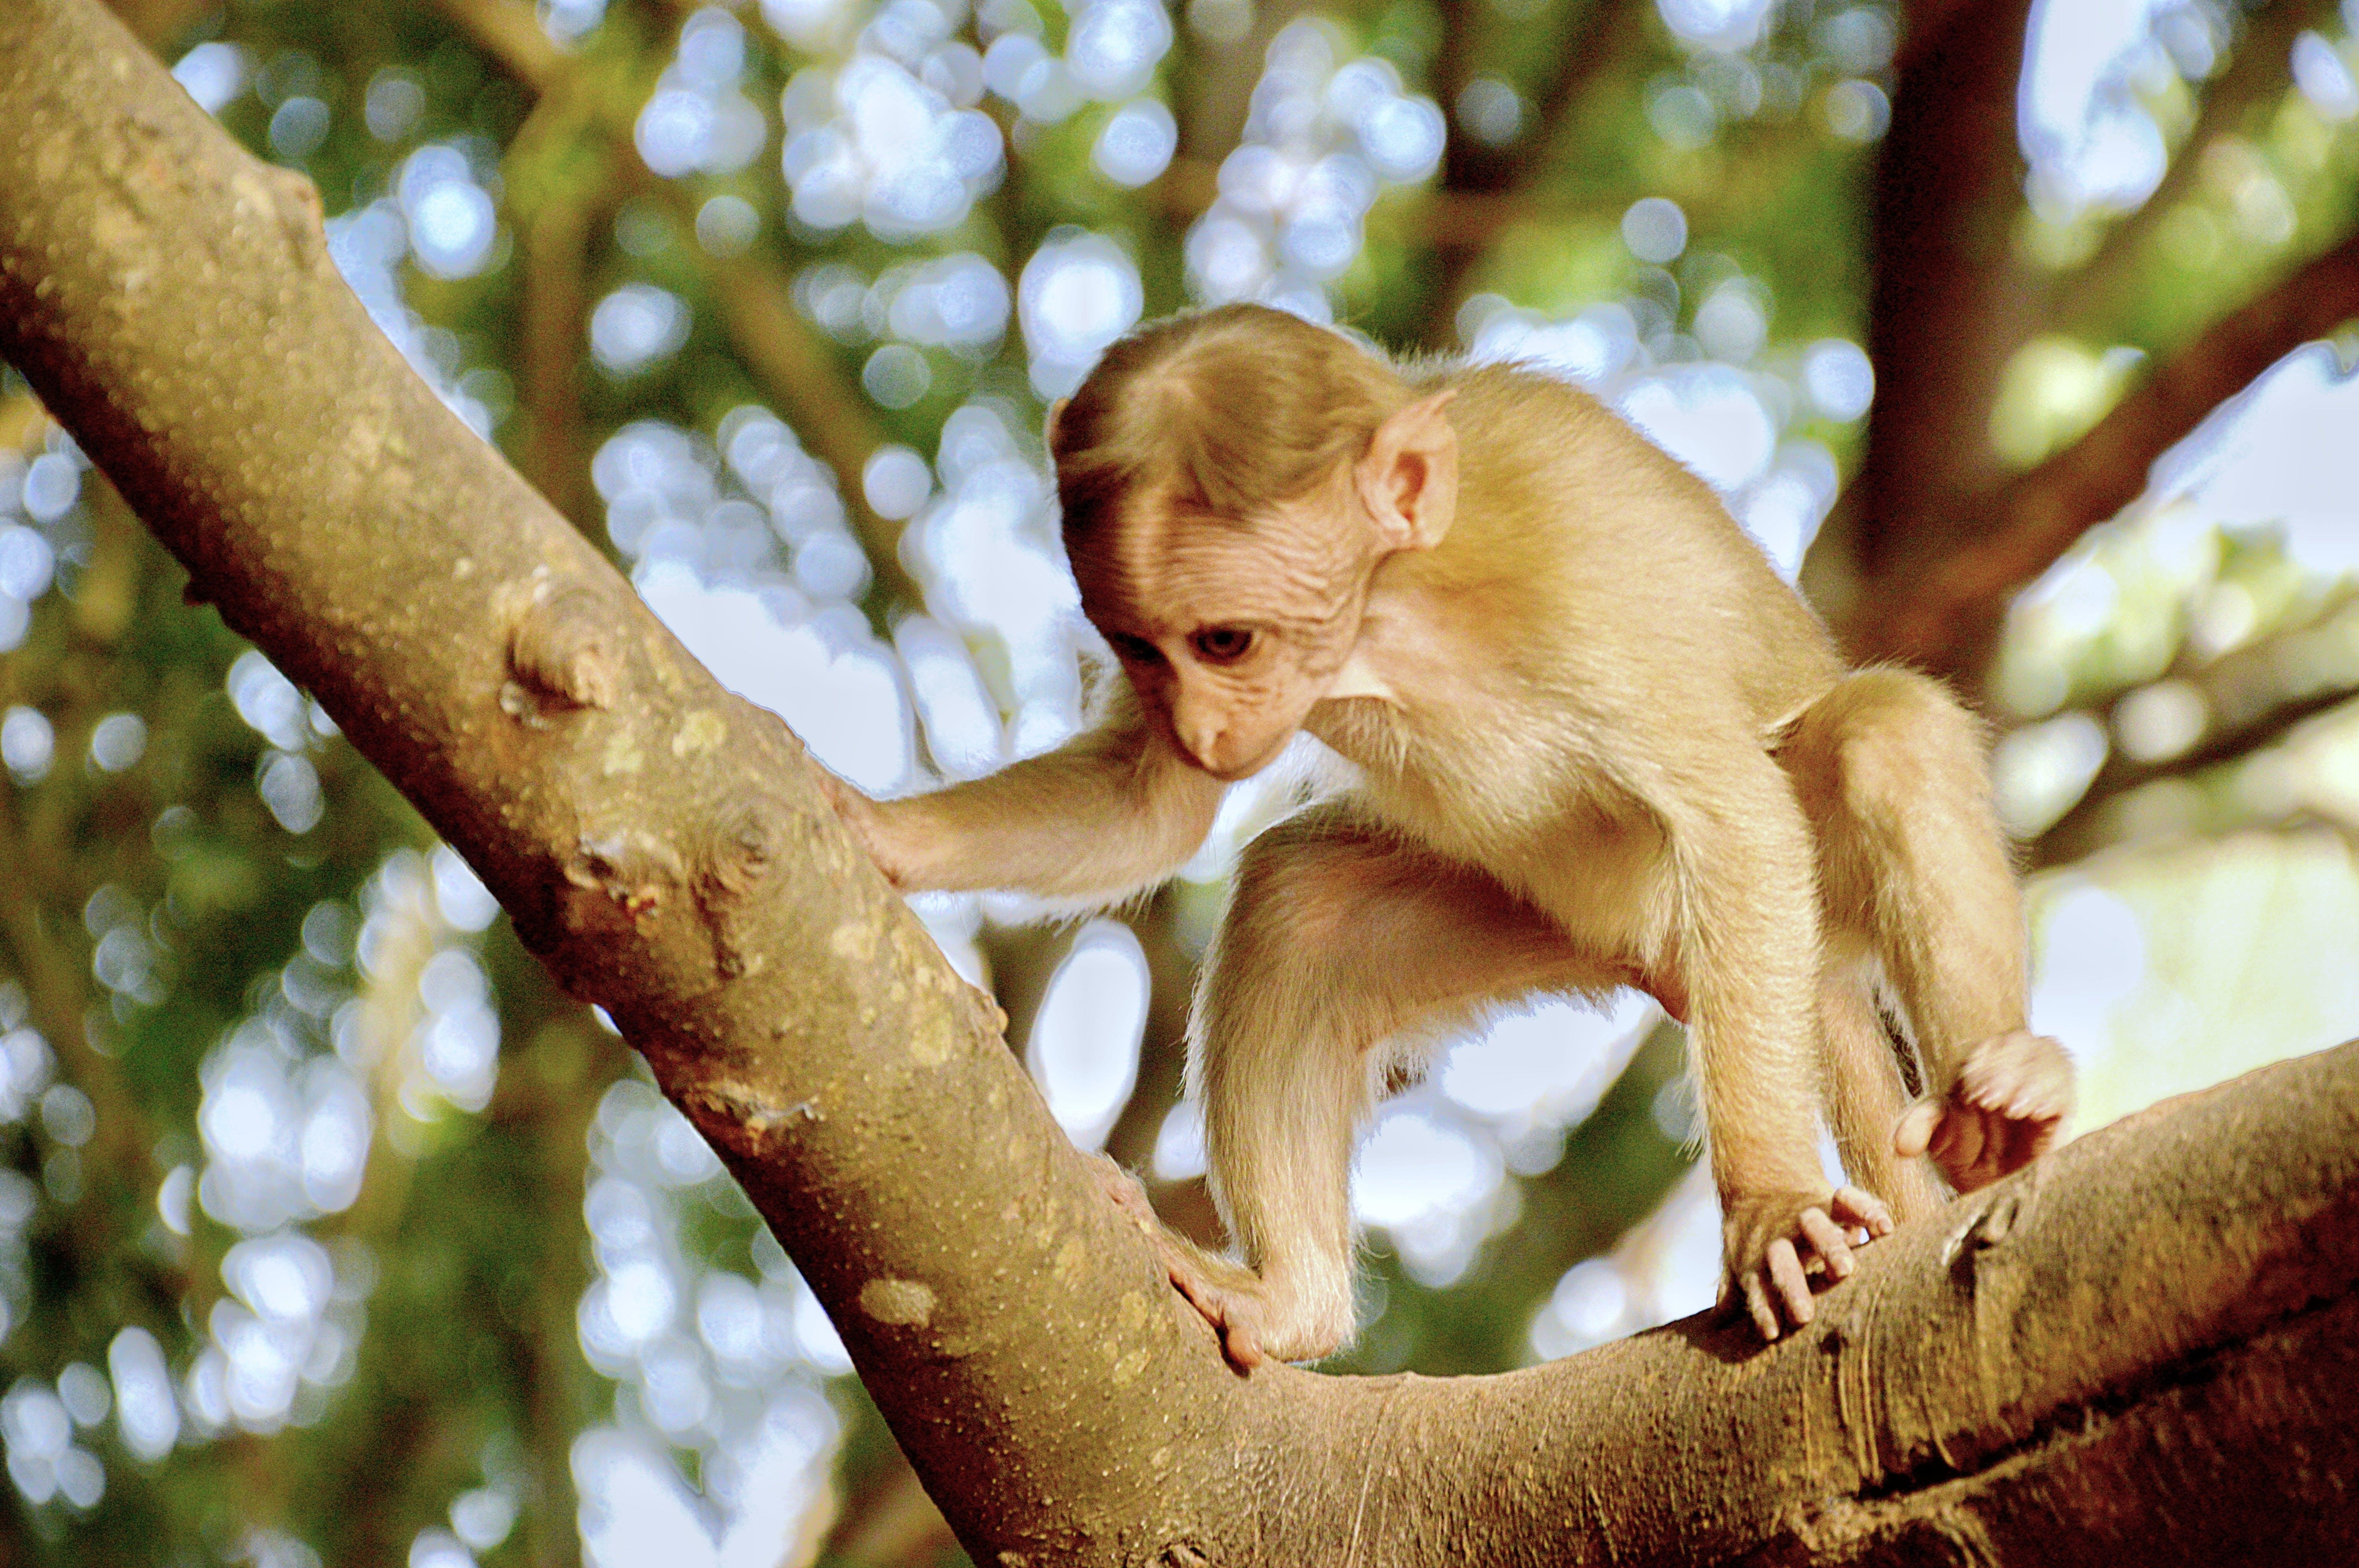 Gratis arkivbilde med ape, apekatt, apeunge, baby